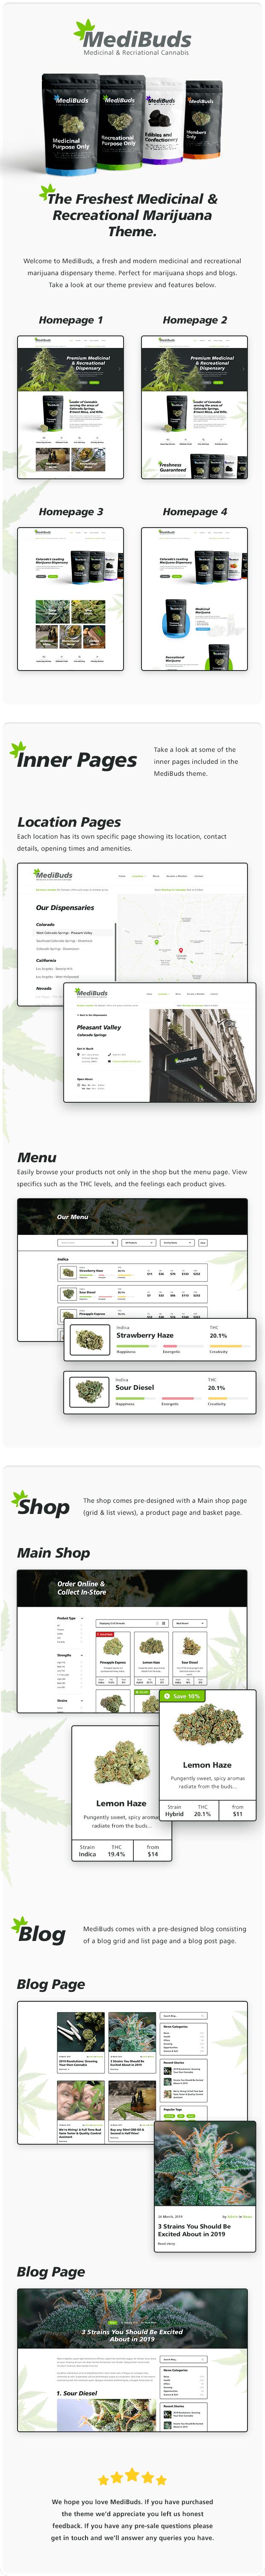 Medibuds - Medical Marijuana Dispensary WordPress Theme - 1